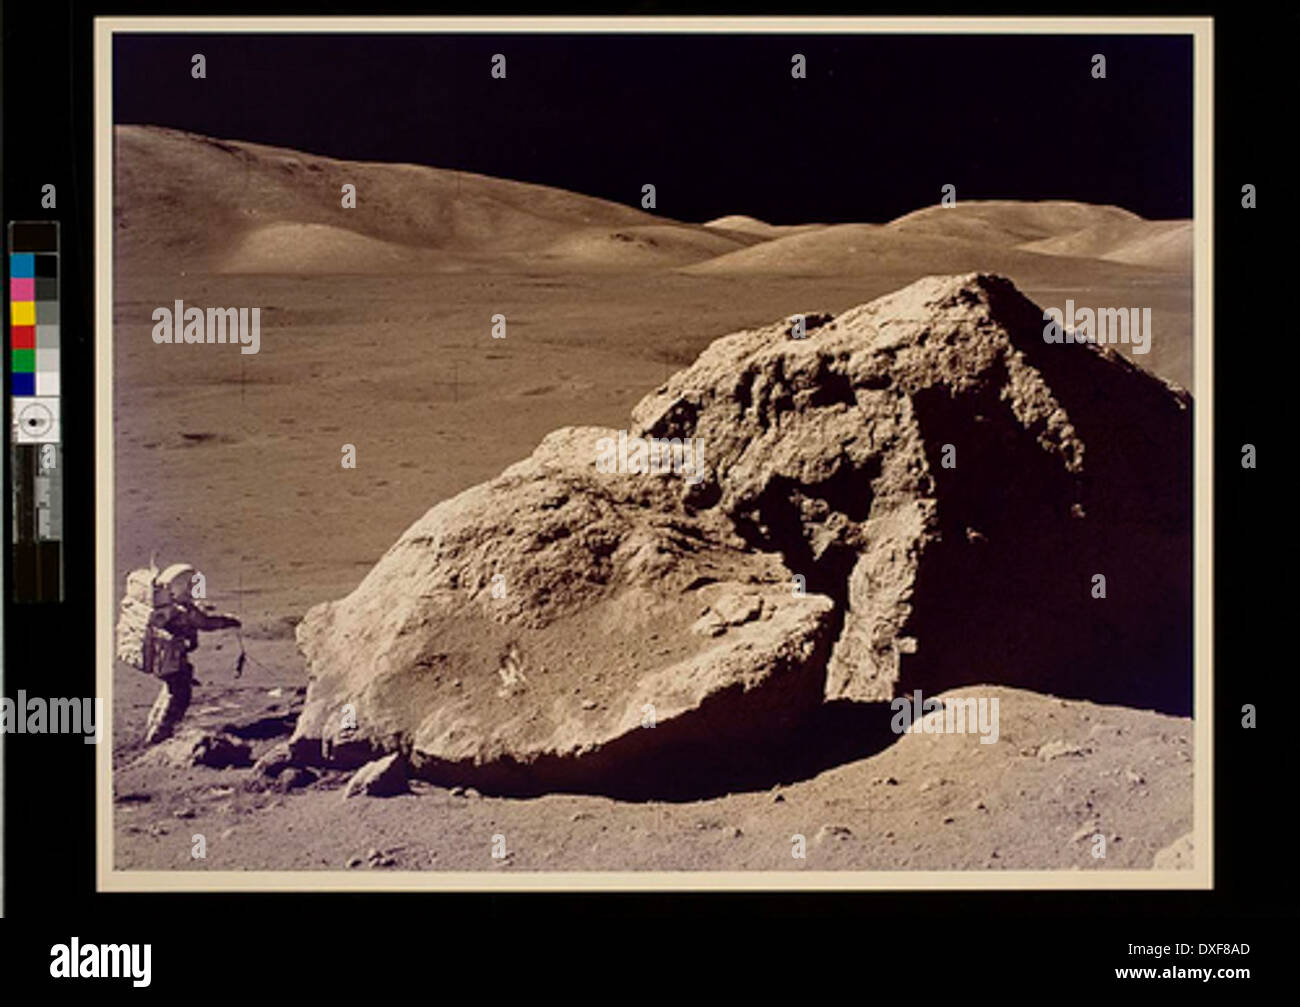 Apollo 17 Astronaut Harrison Schmitt Collects Lunar Rock Samples - Stock Image